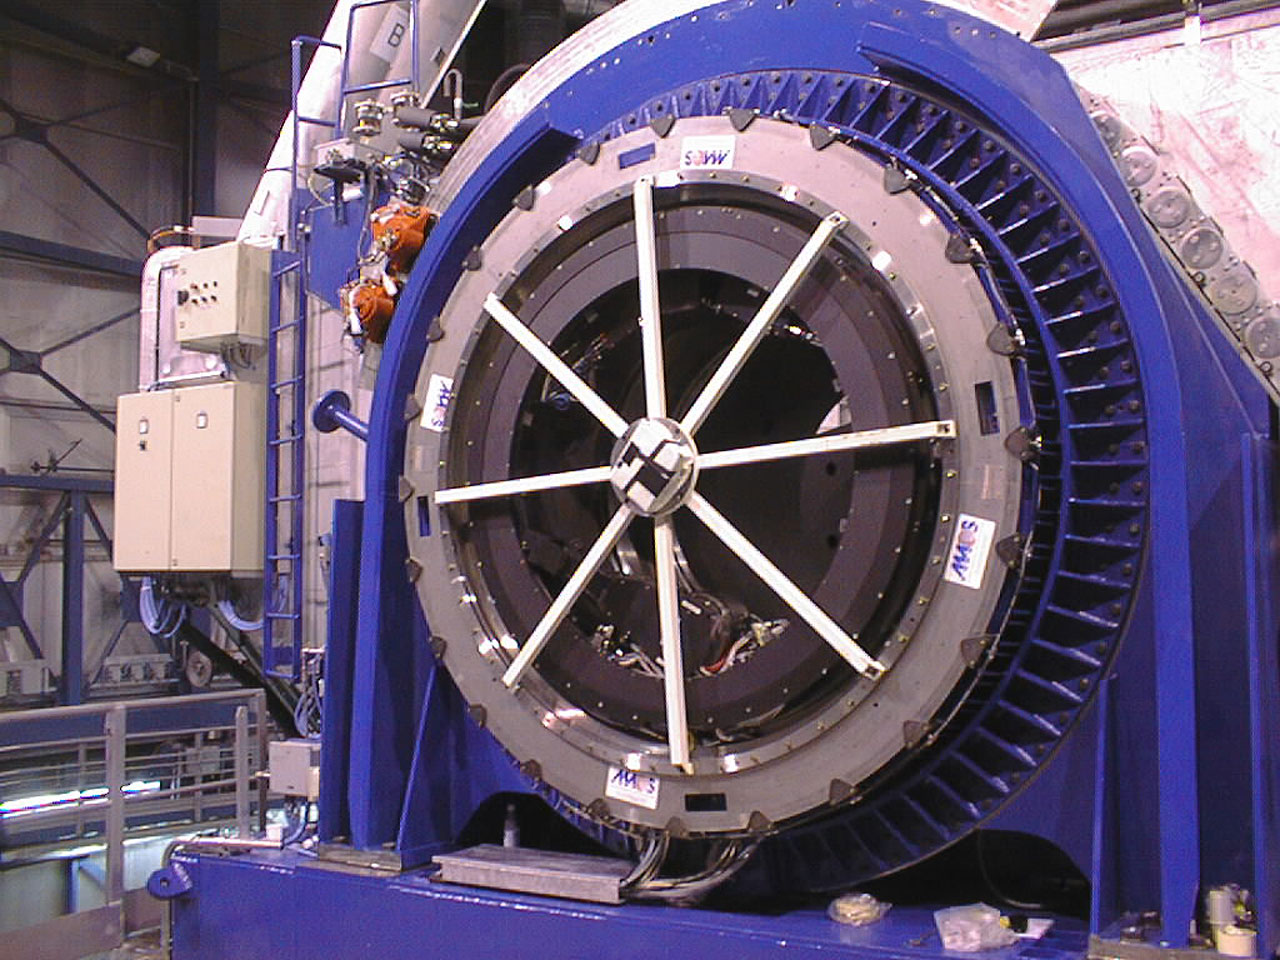 Installation of the Nasmyth Adapter-Rotators